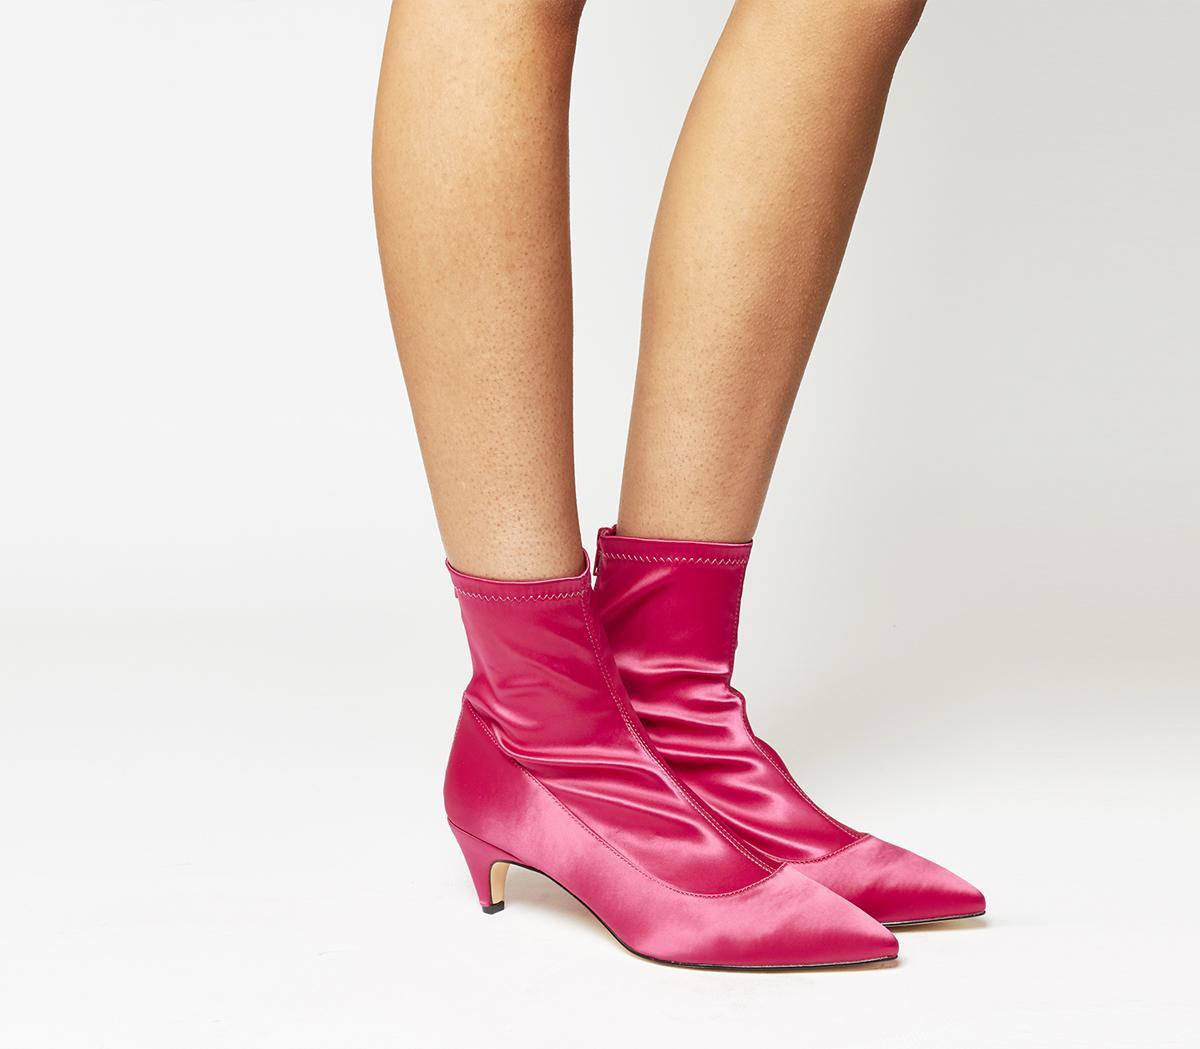 Atomic Stretch Kitten Heeled Boots